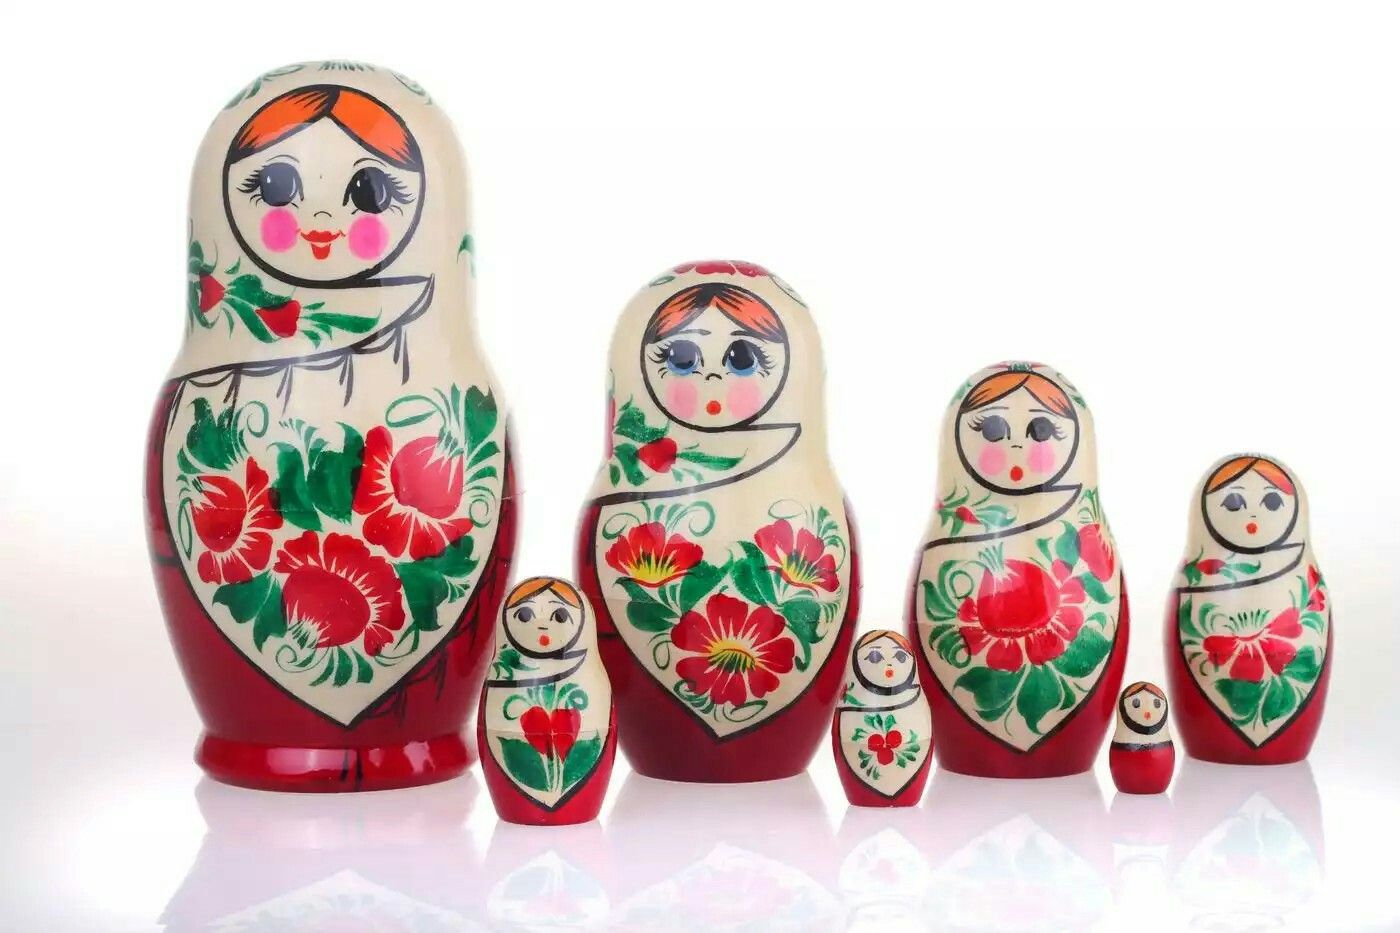 Картинки матрешки русской